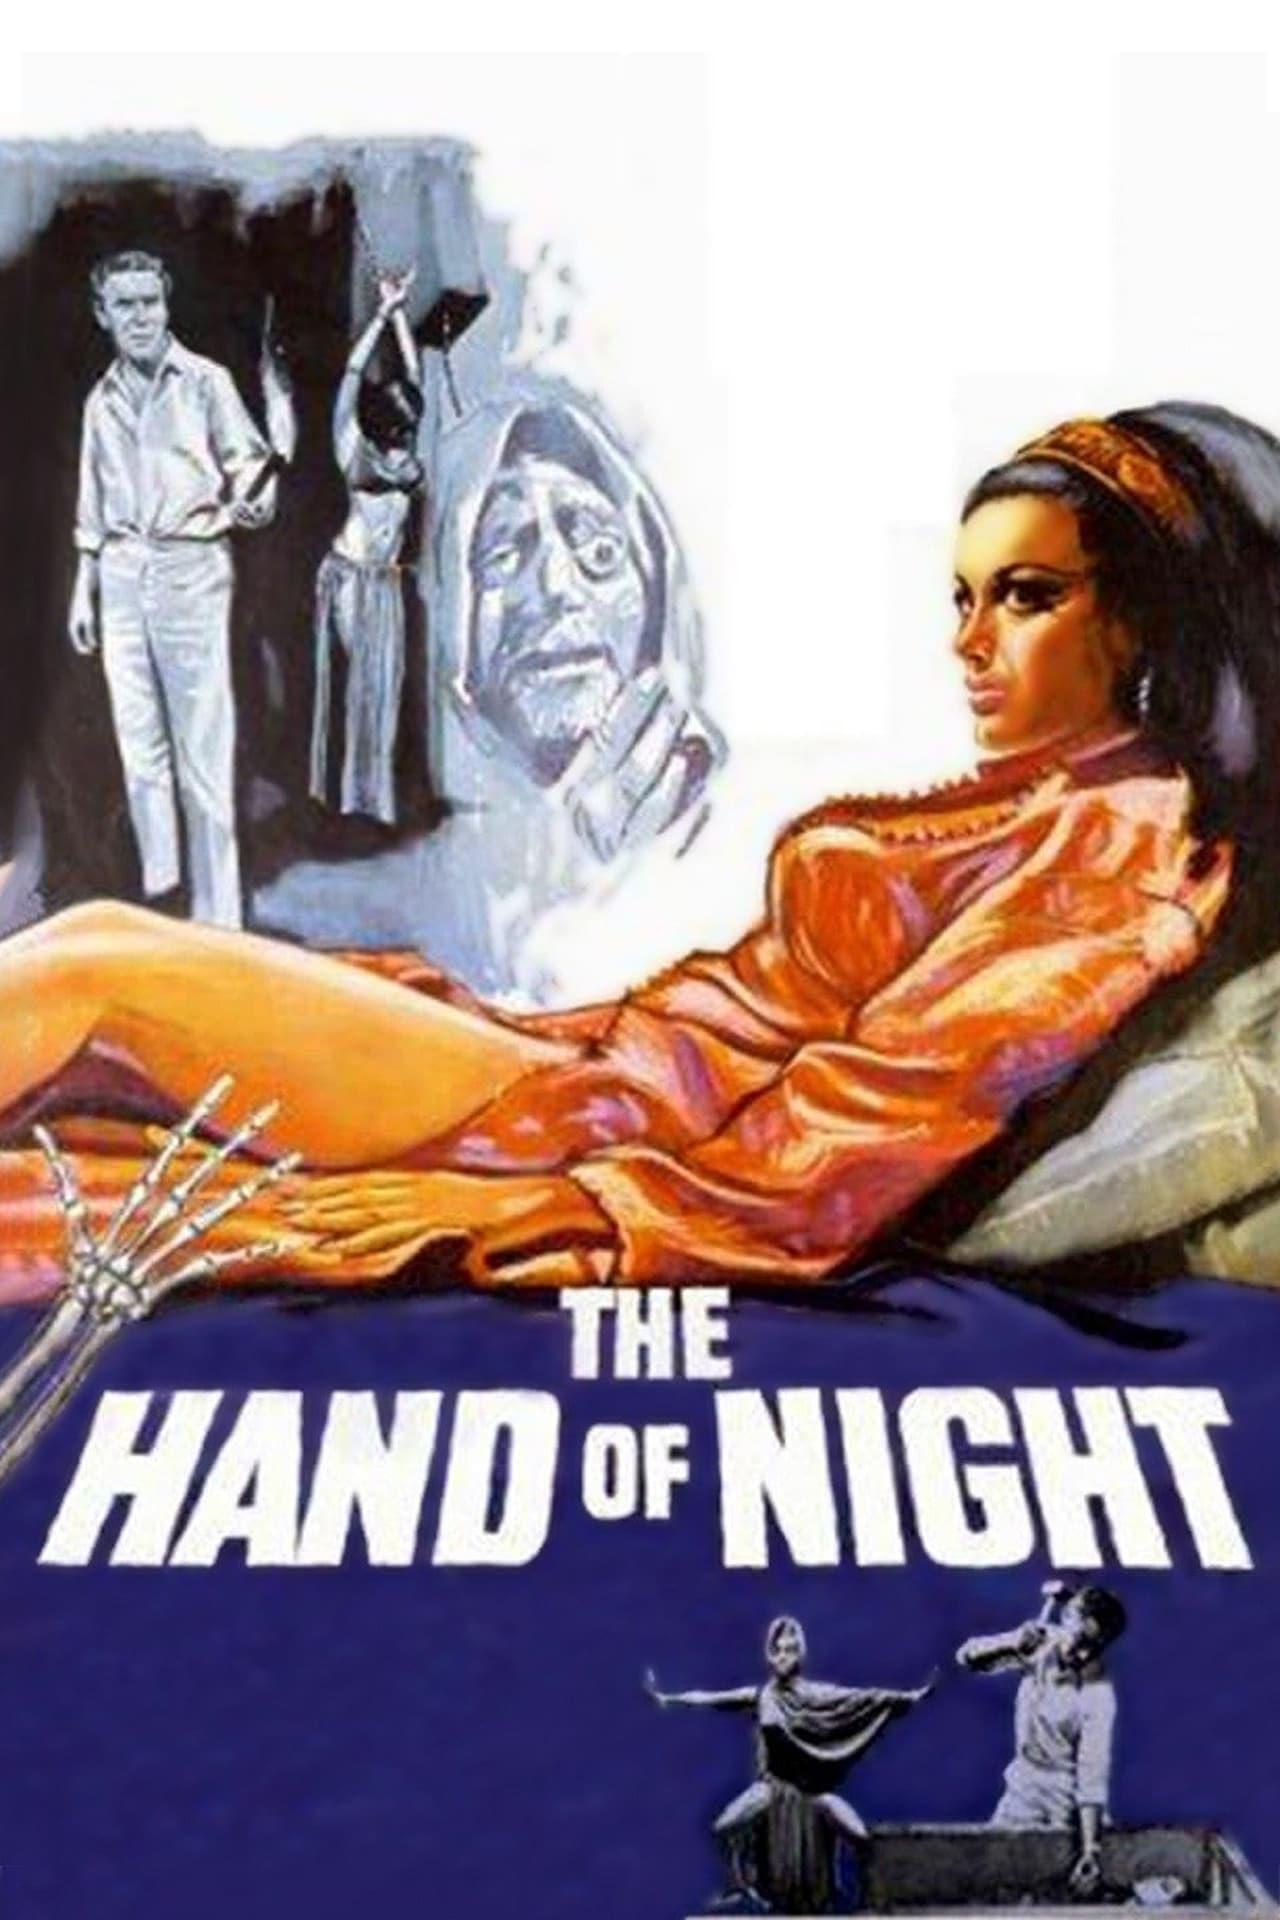 The Hand of Night